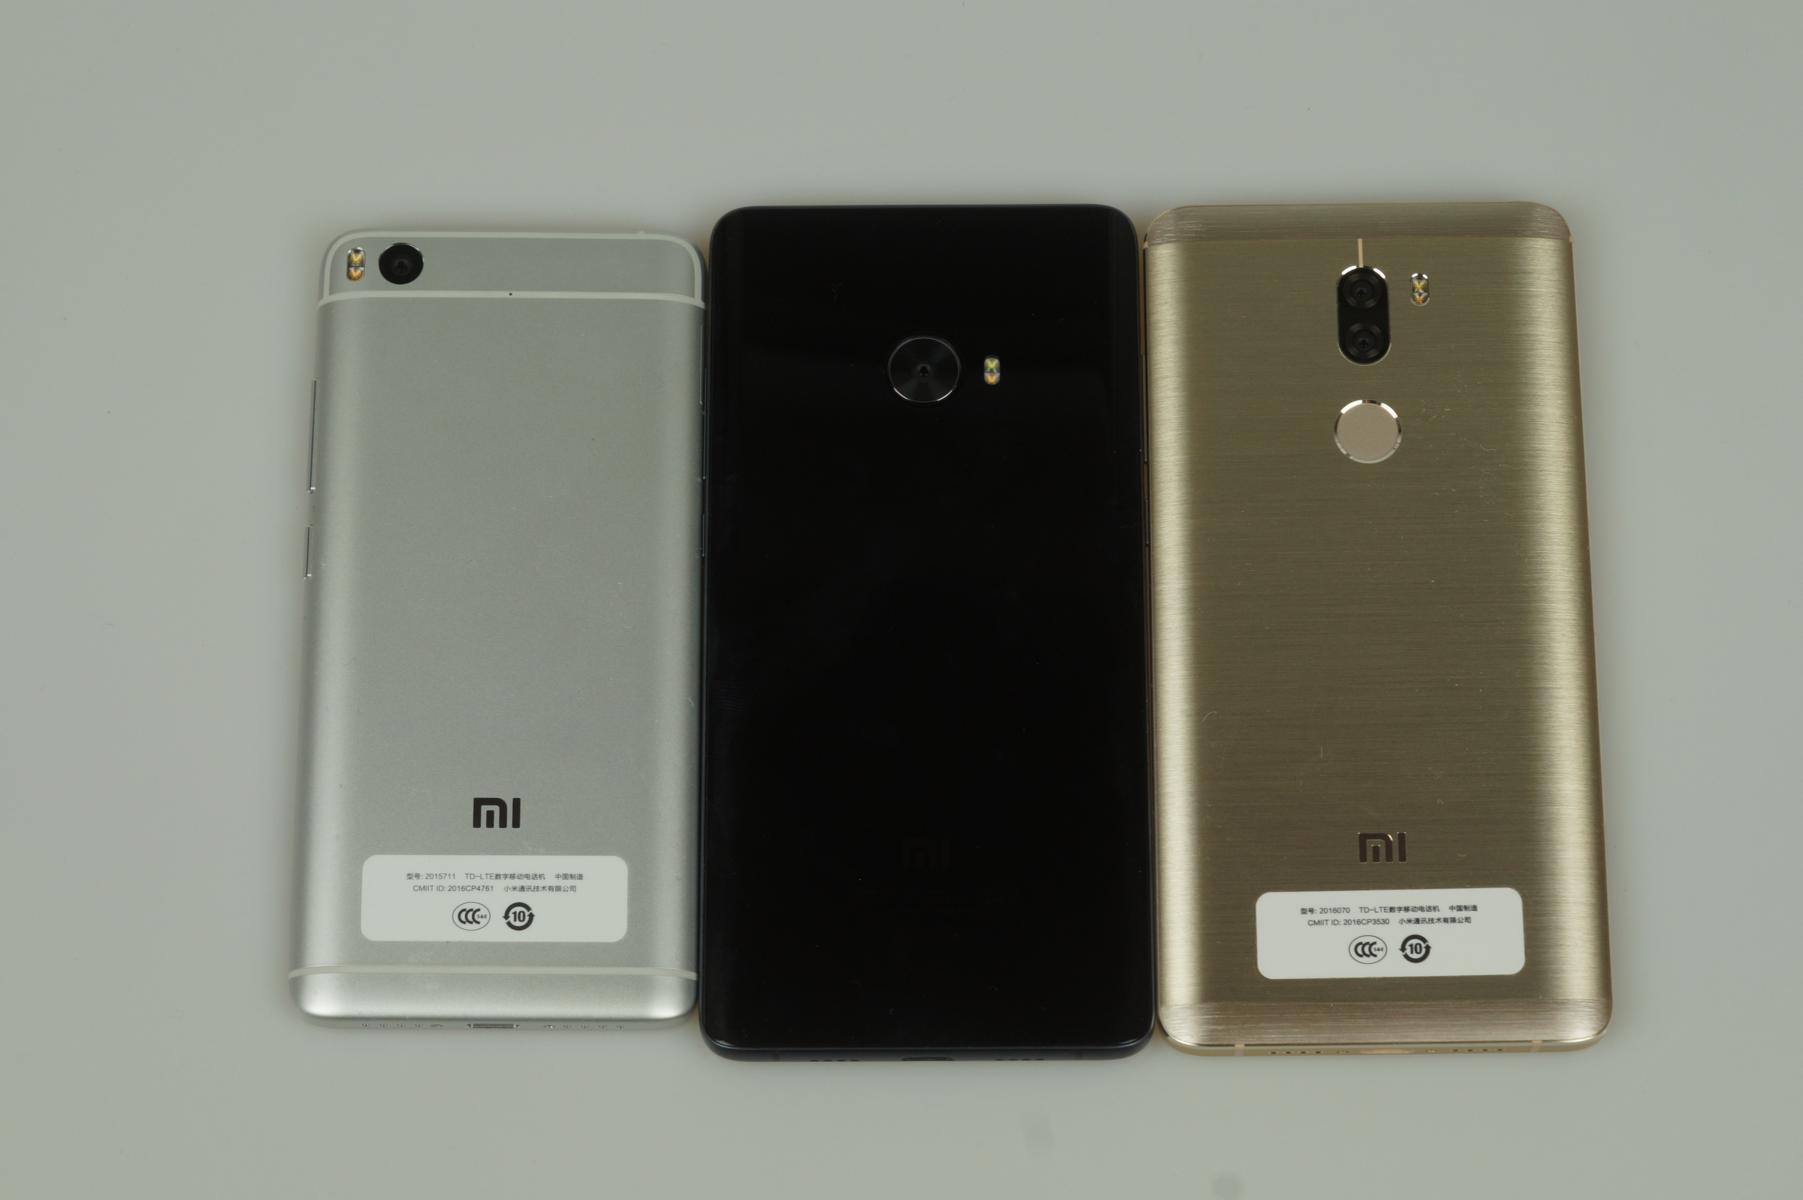 xiaomi-mi-note-2-mi5s-mi5s-plus